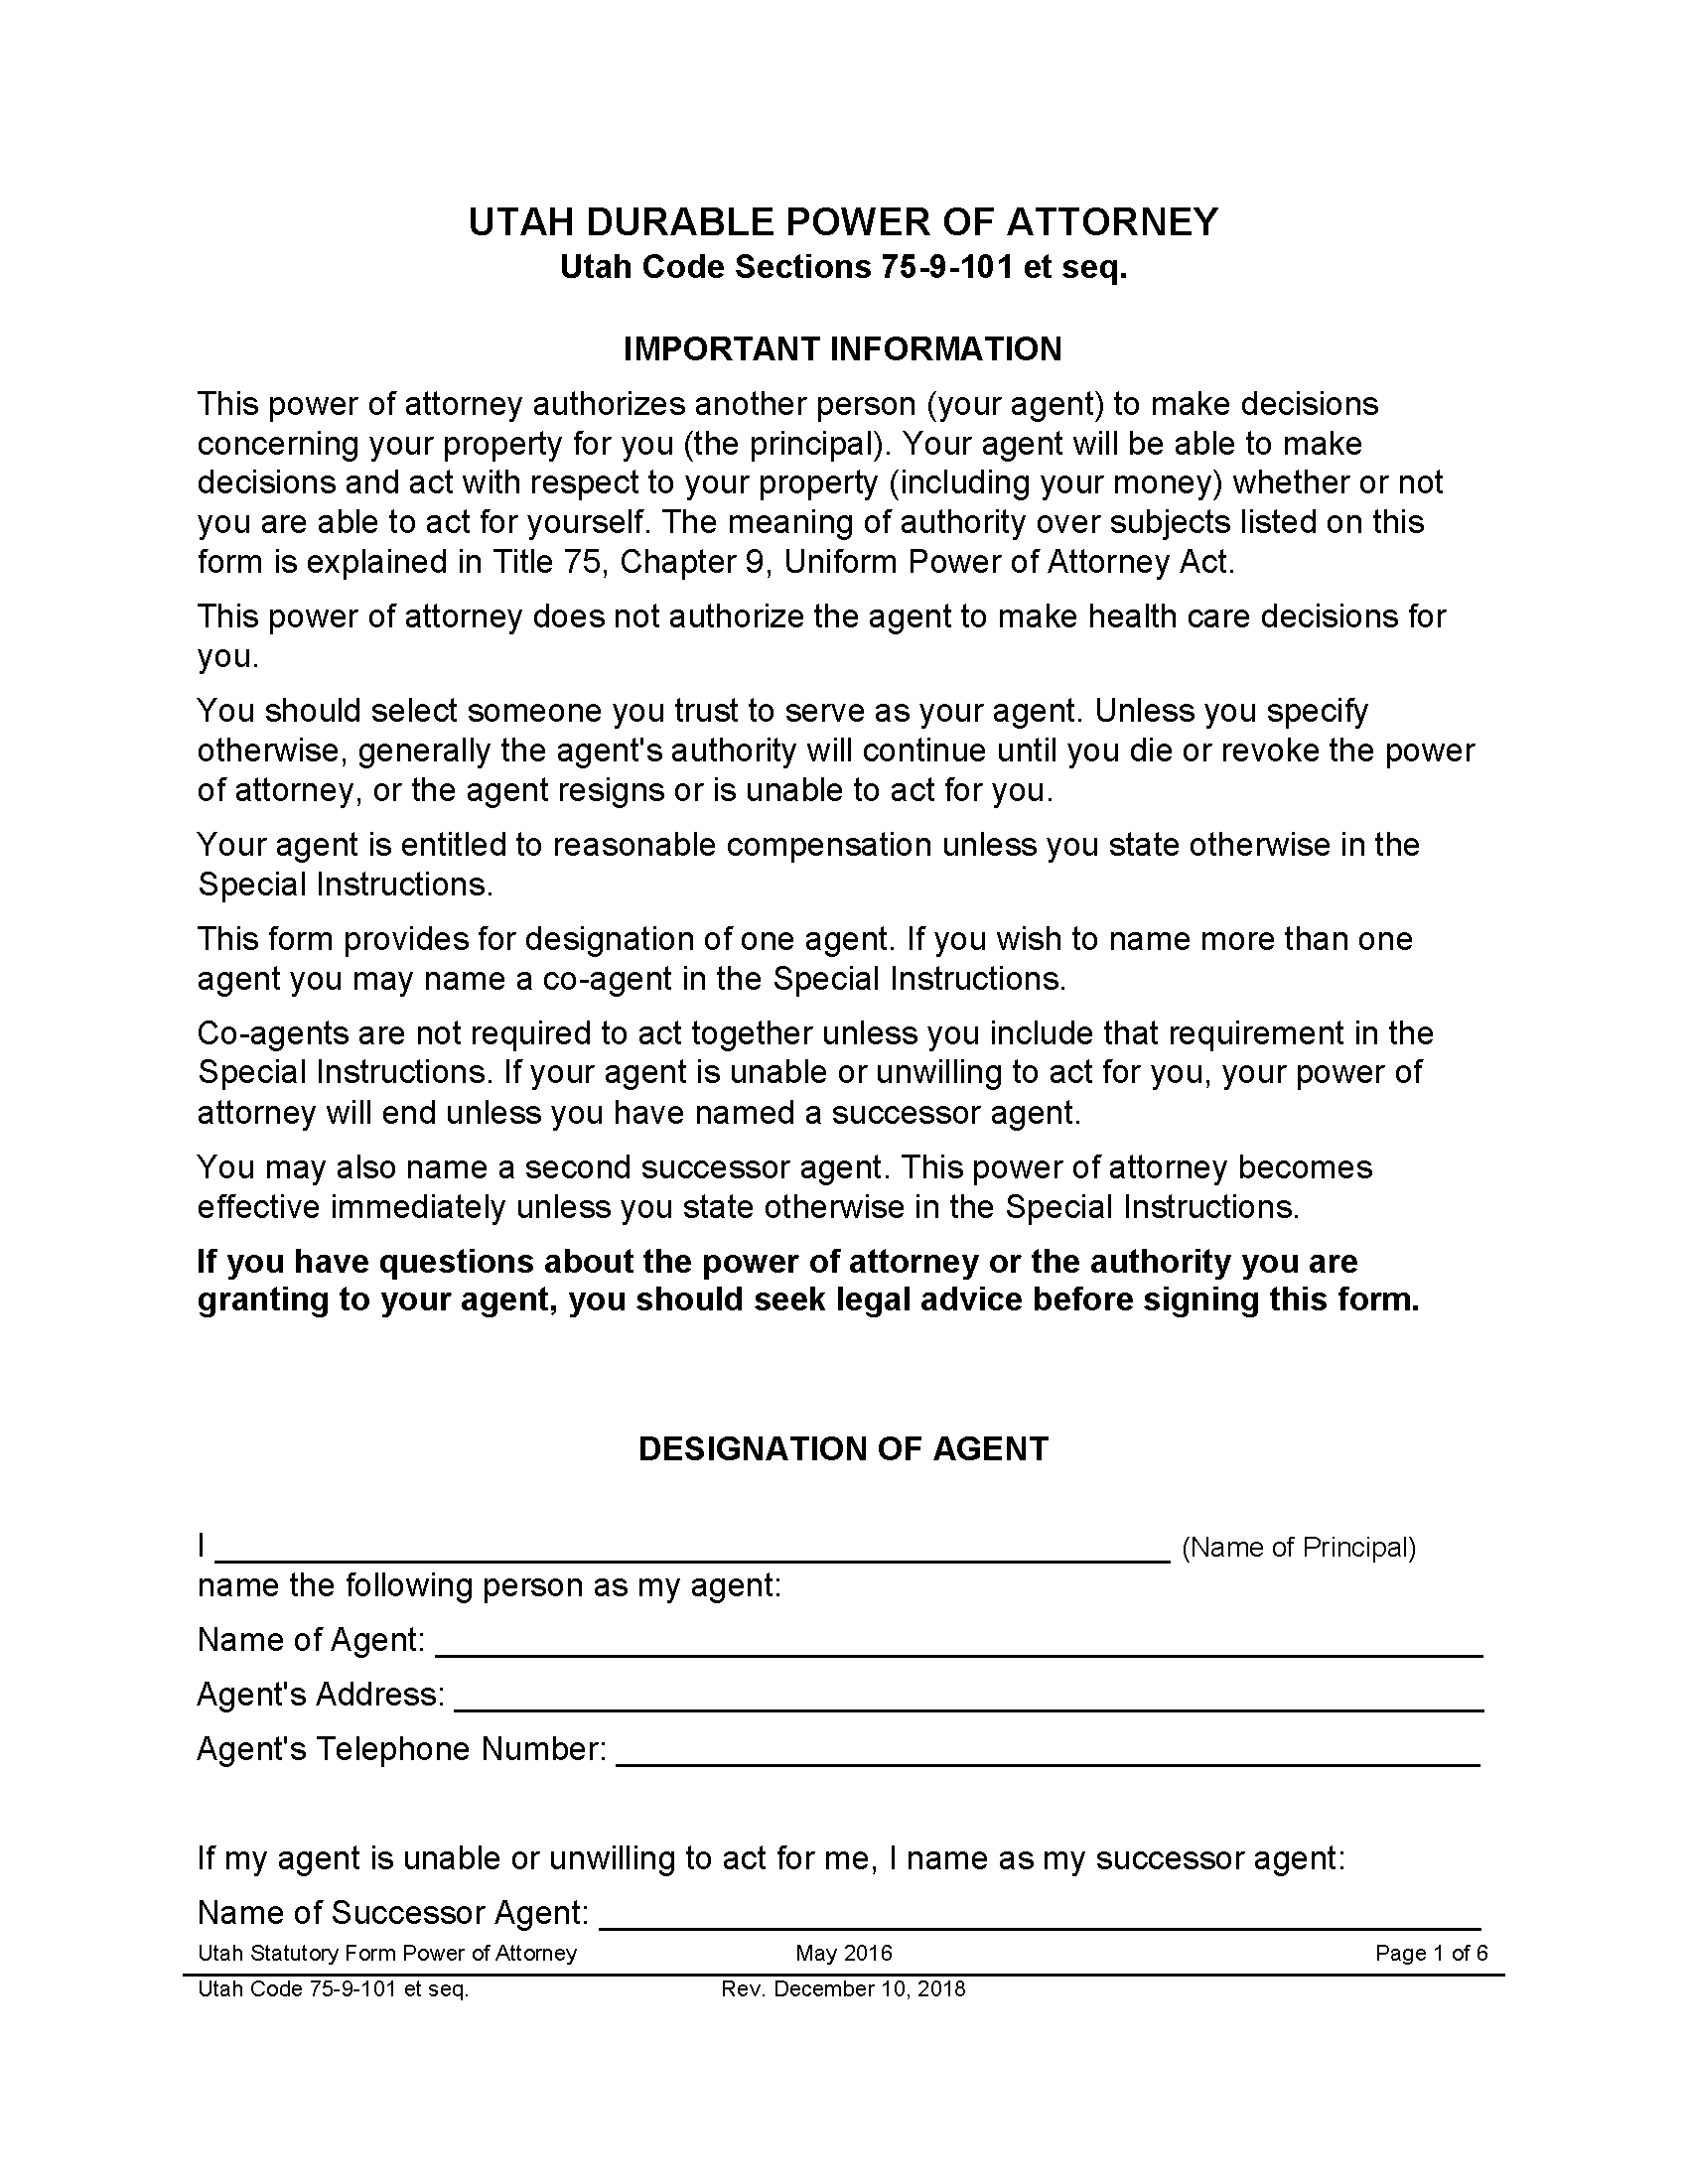 Utah Financial Power of Attorney Form